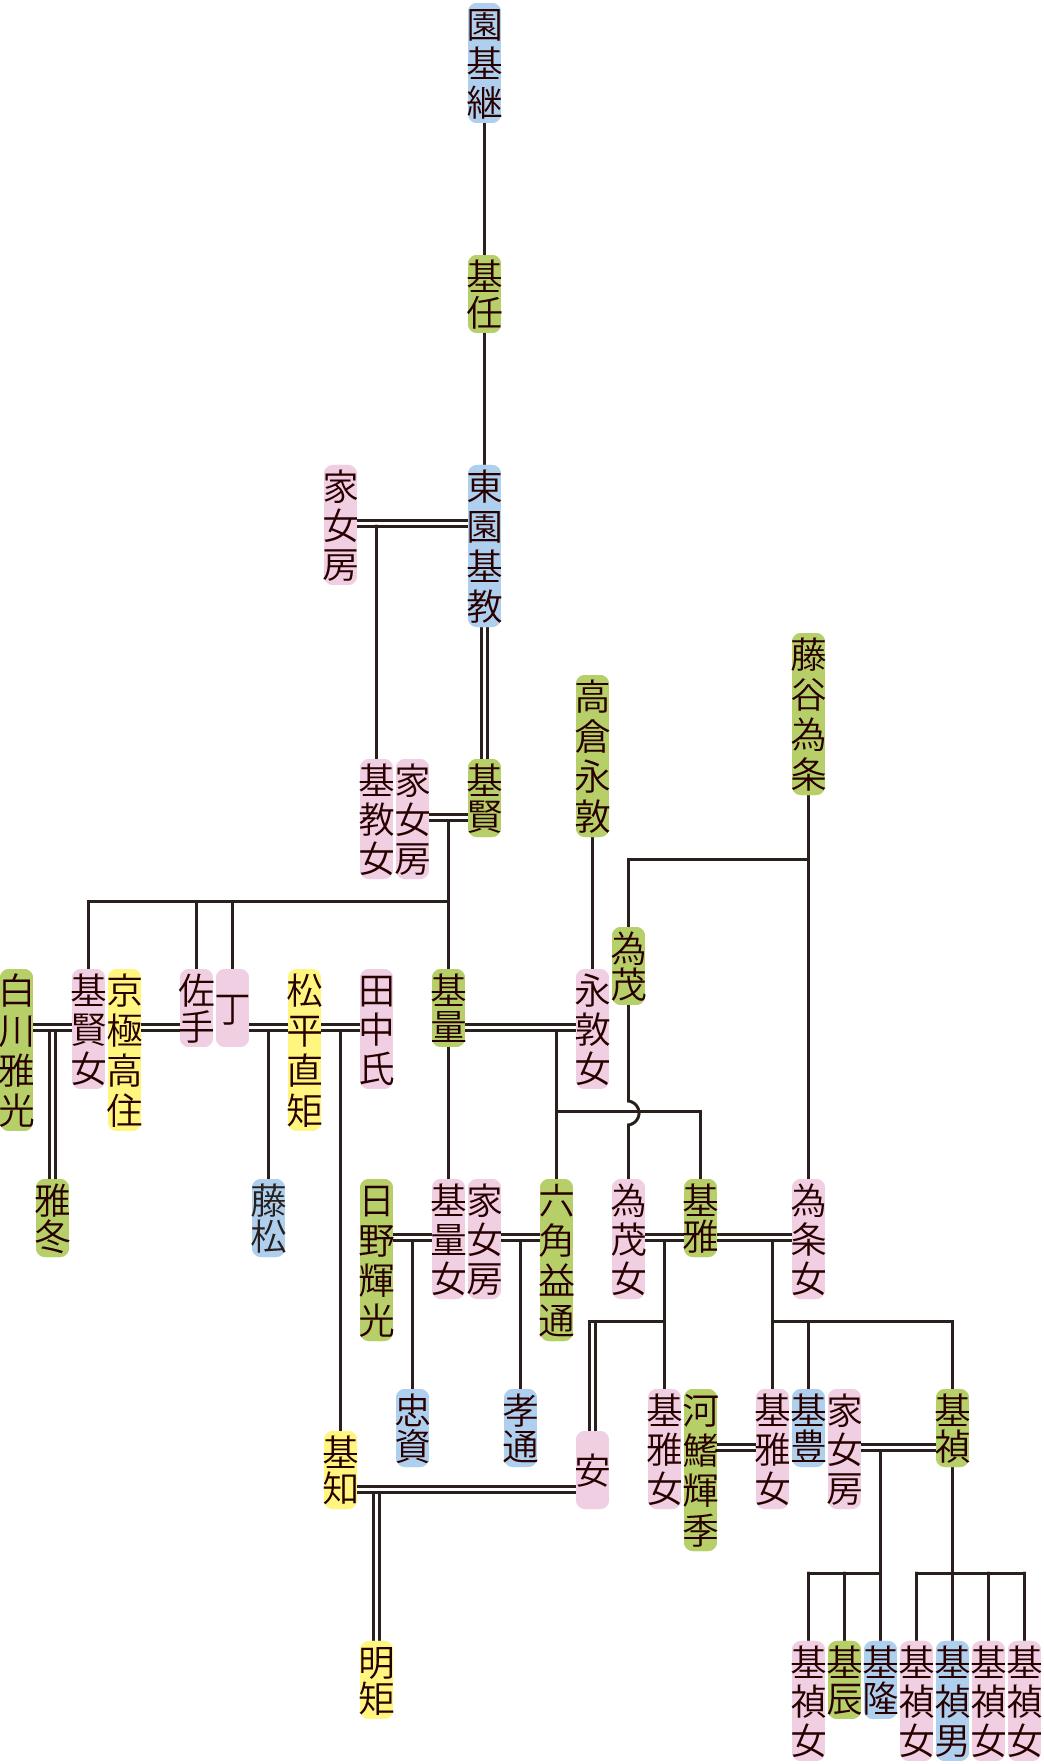 東園基教~基雅の系図